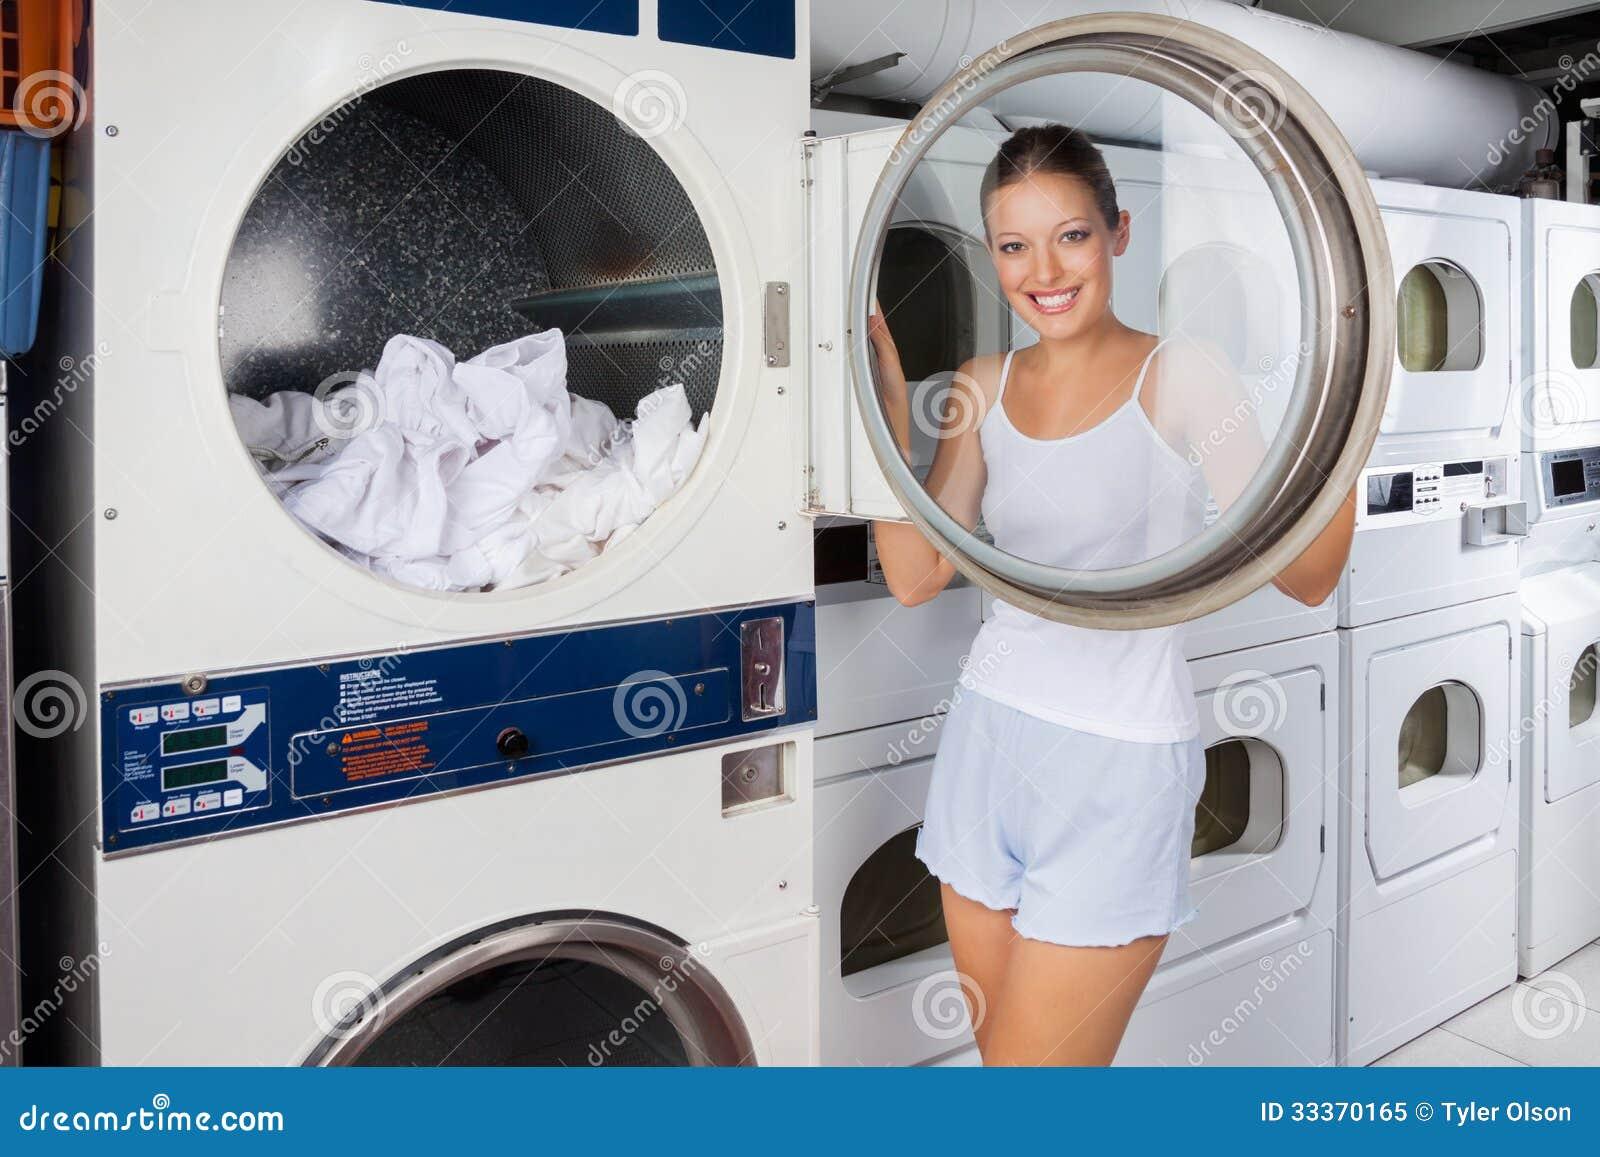 Coin Washing Machine >> Woman Looking Through Washing Machine Lid Royalty Free ...